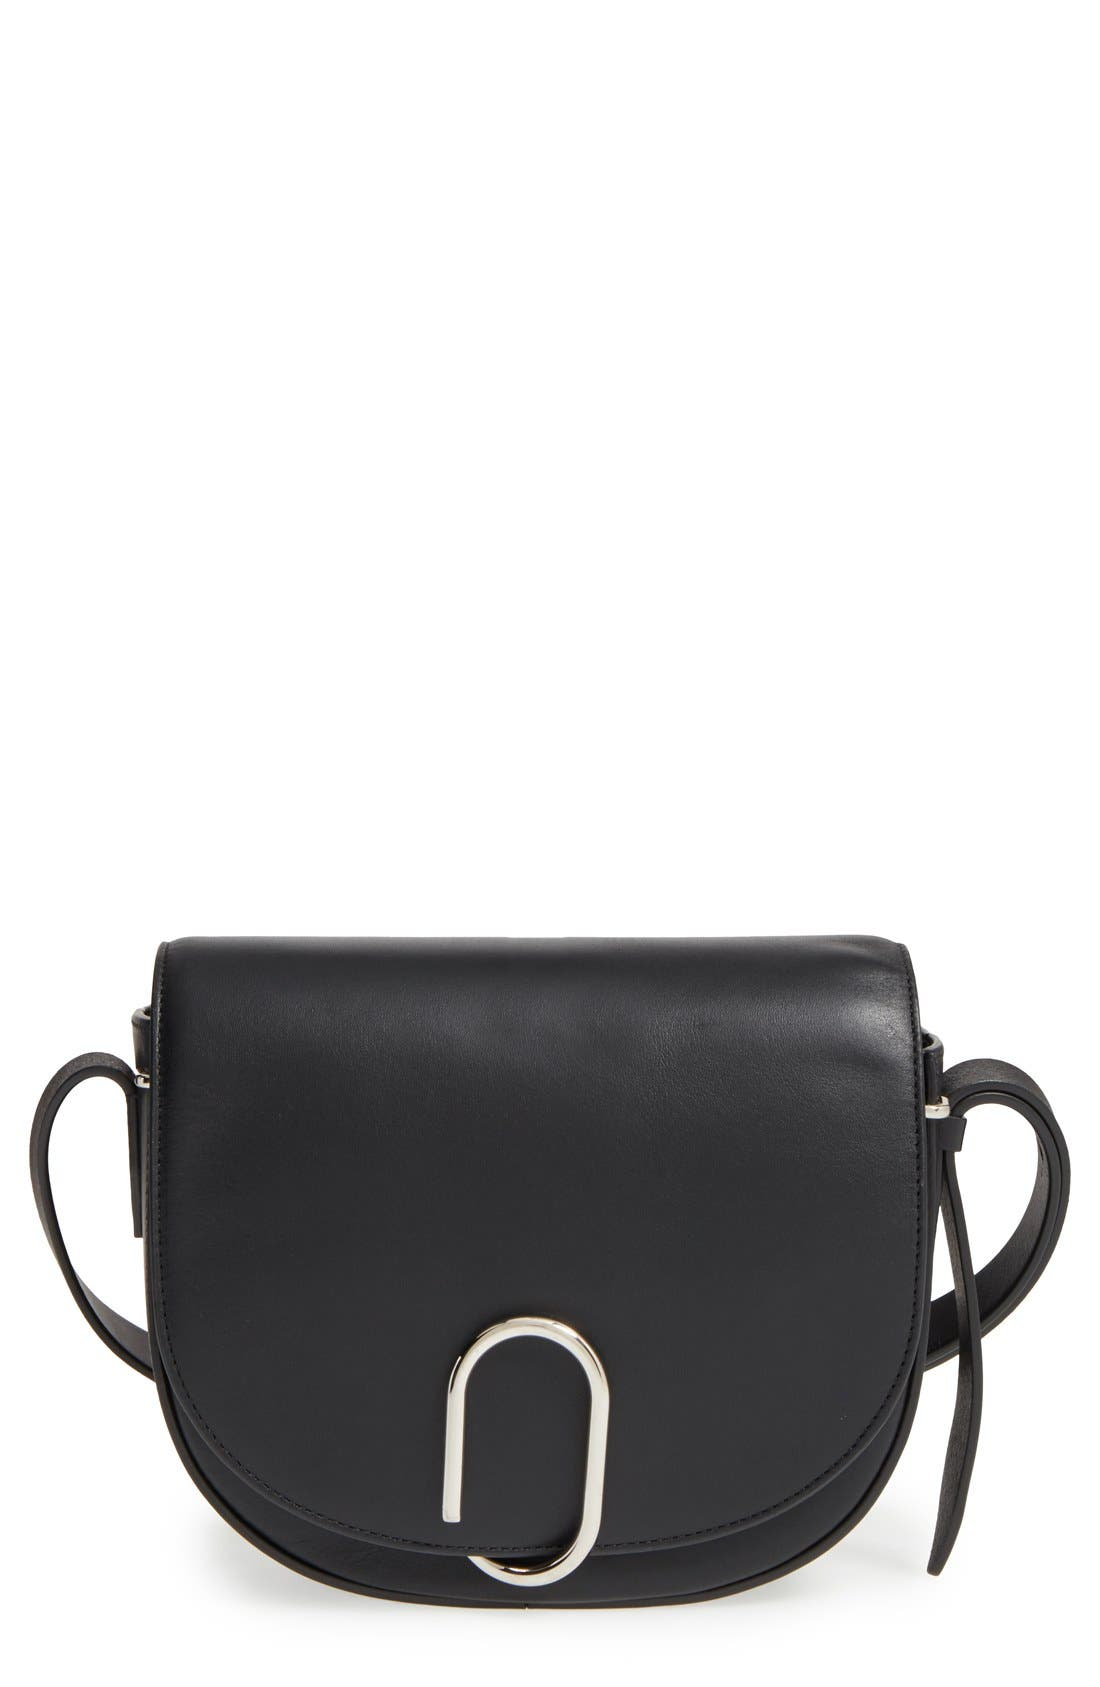 Alix Leather Saddle Bag,                             Main thumbnail 1, color,